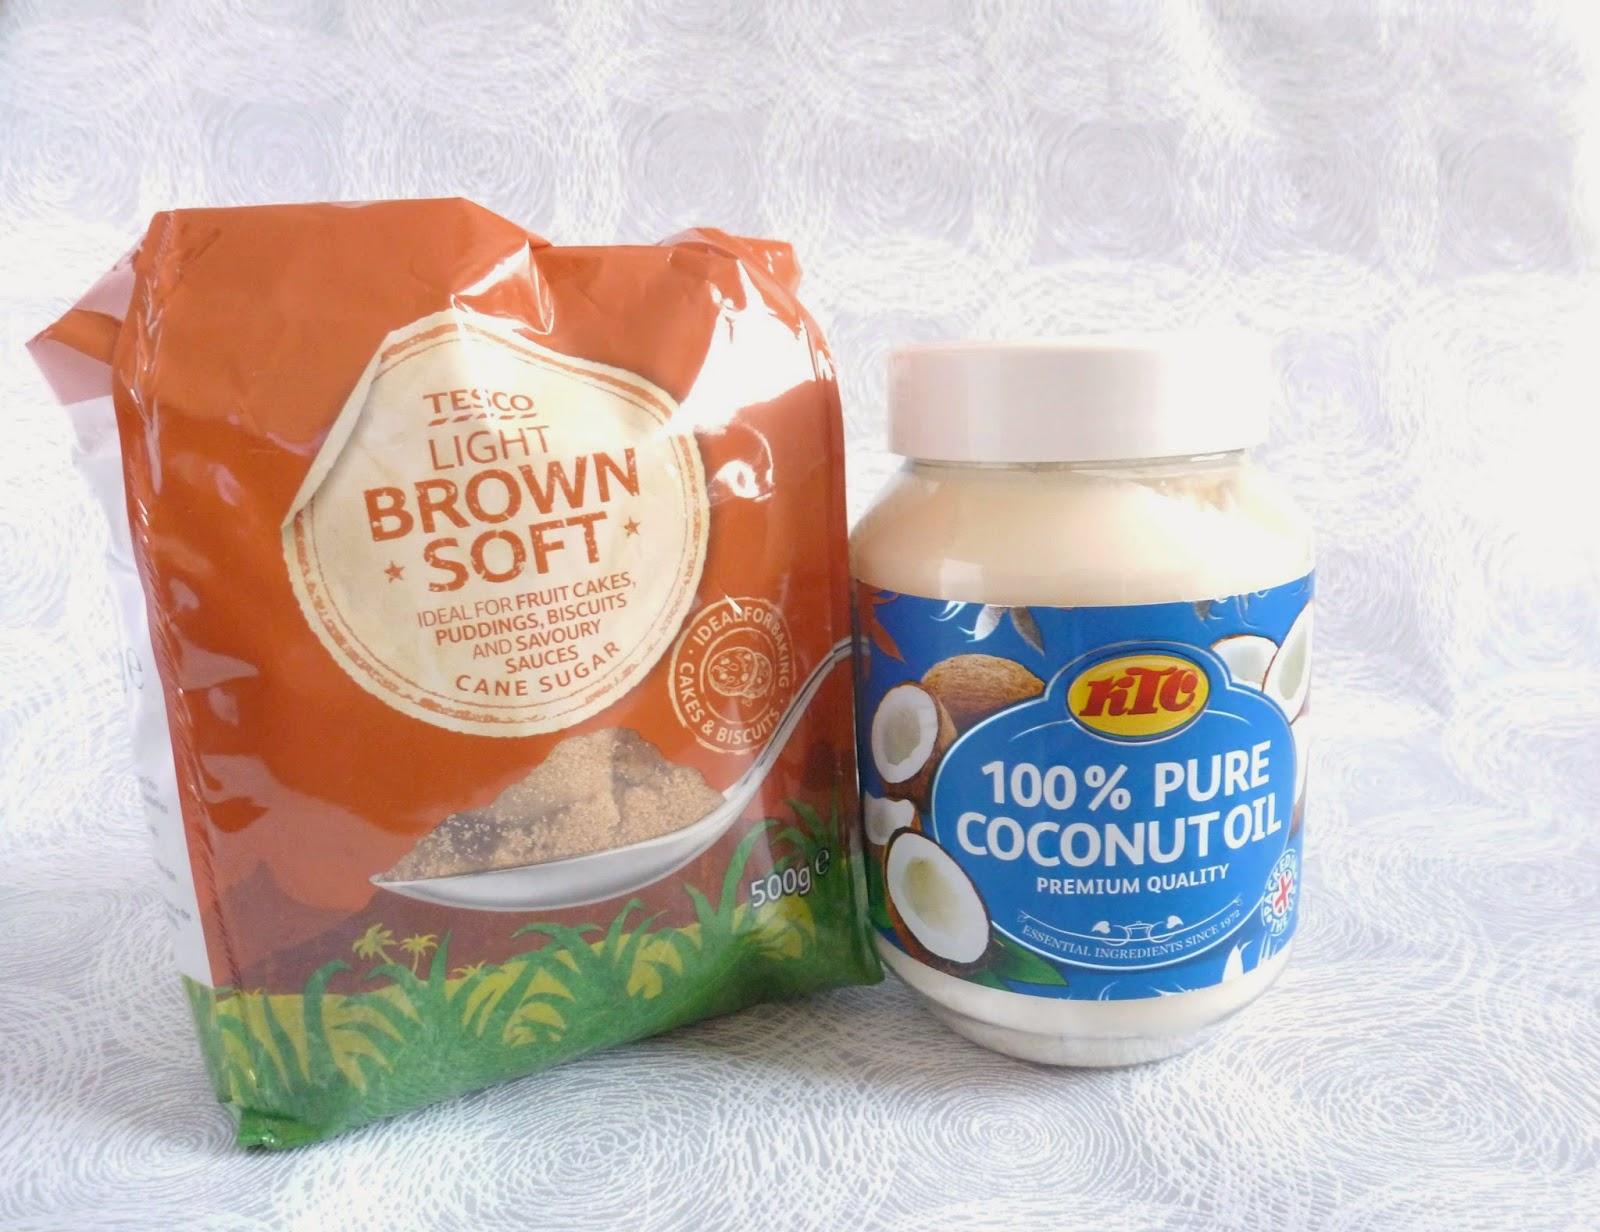 Tesco's brown sugar and coconut oil - to make a homemade scrub